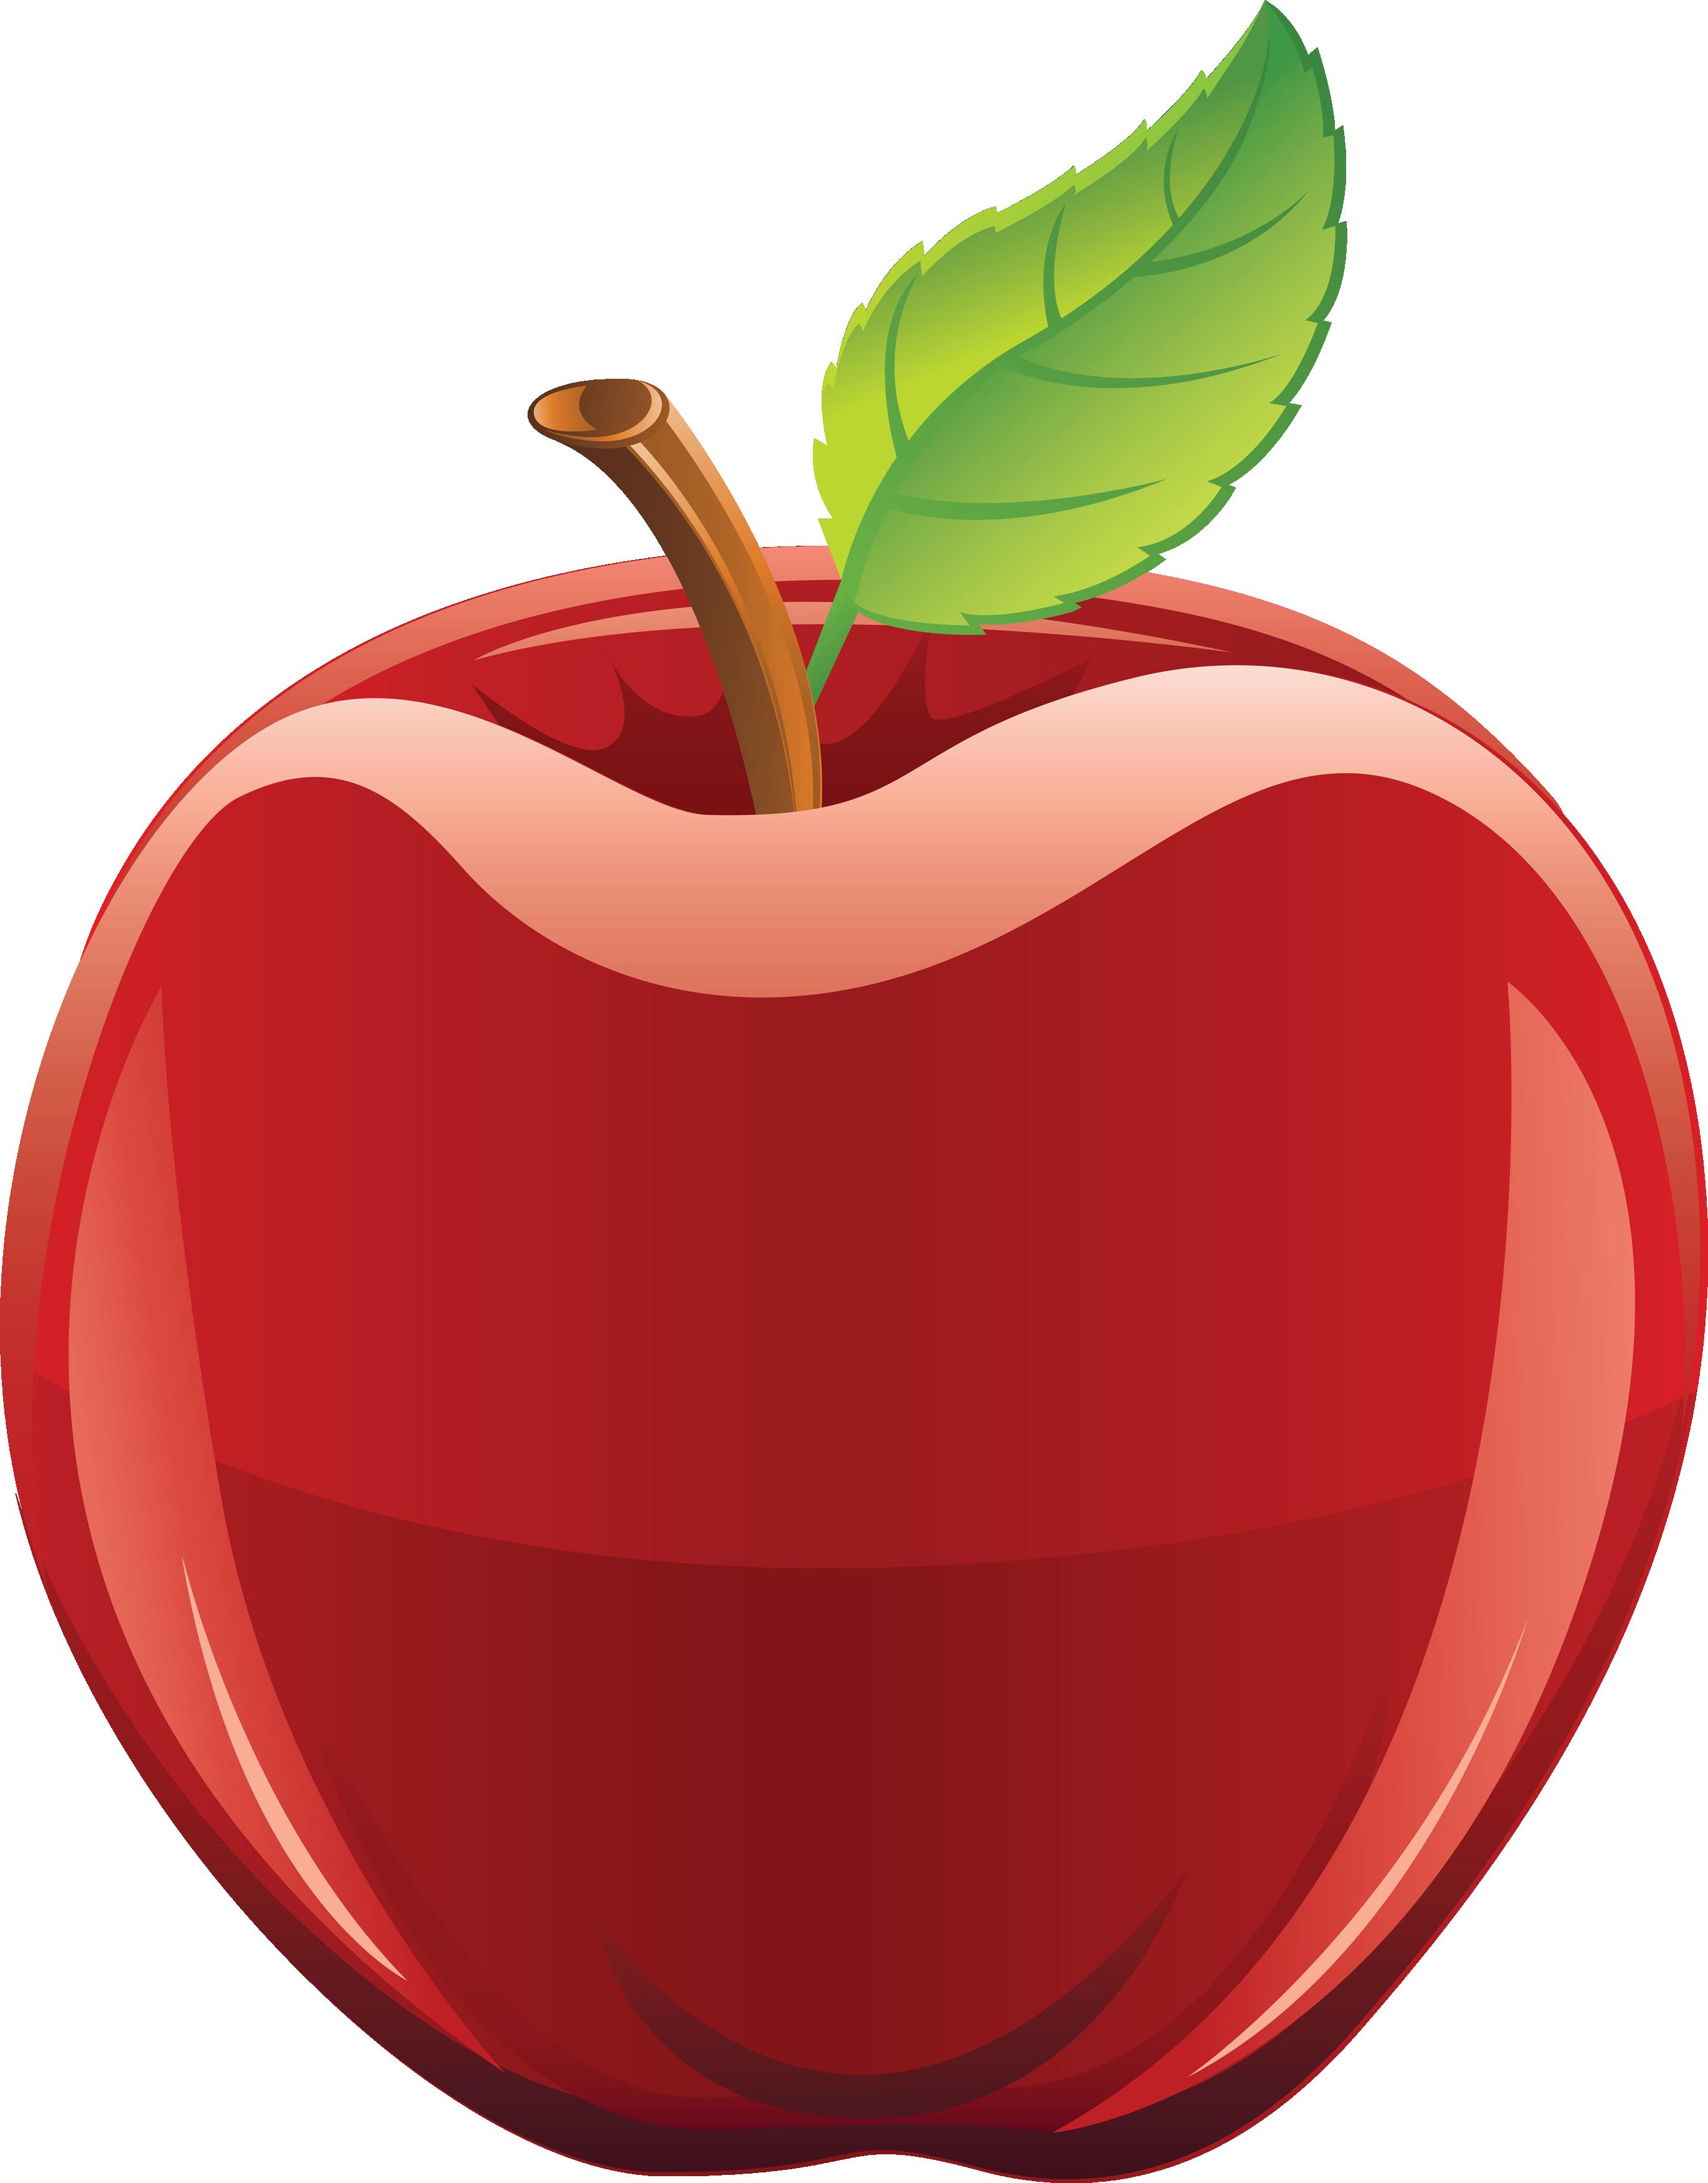 2742x3504 Apple Clip Art Free Clipart Images